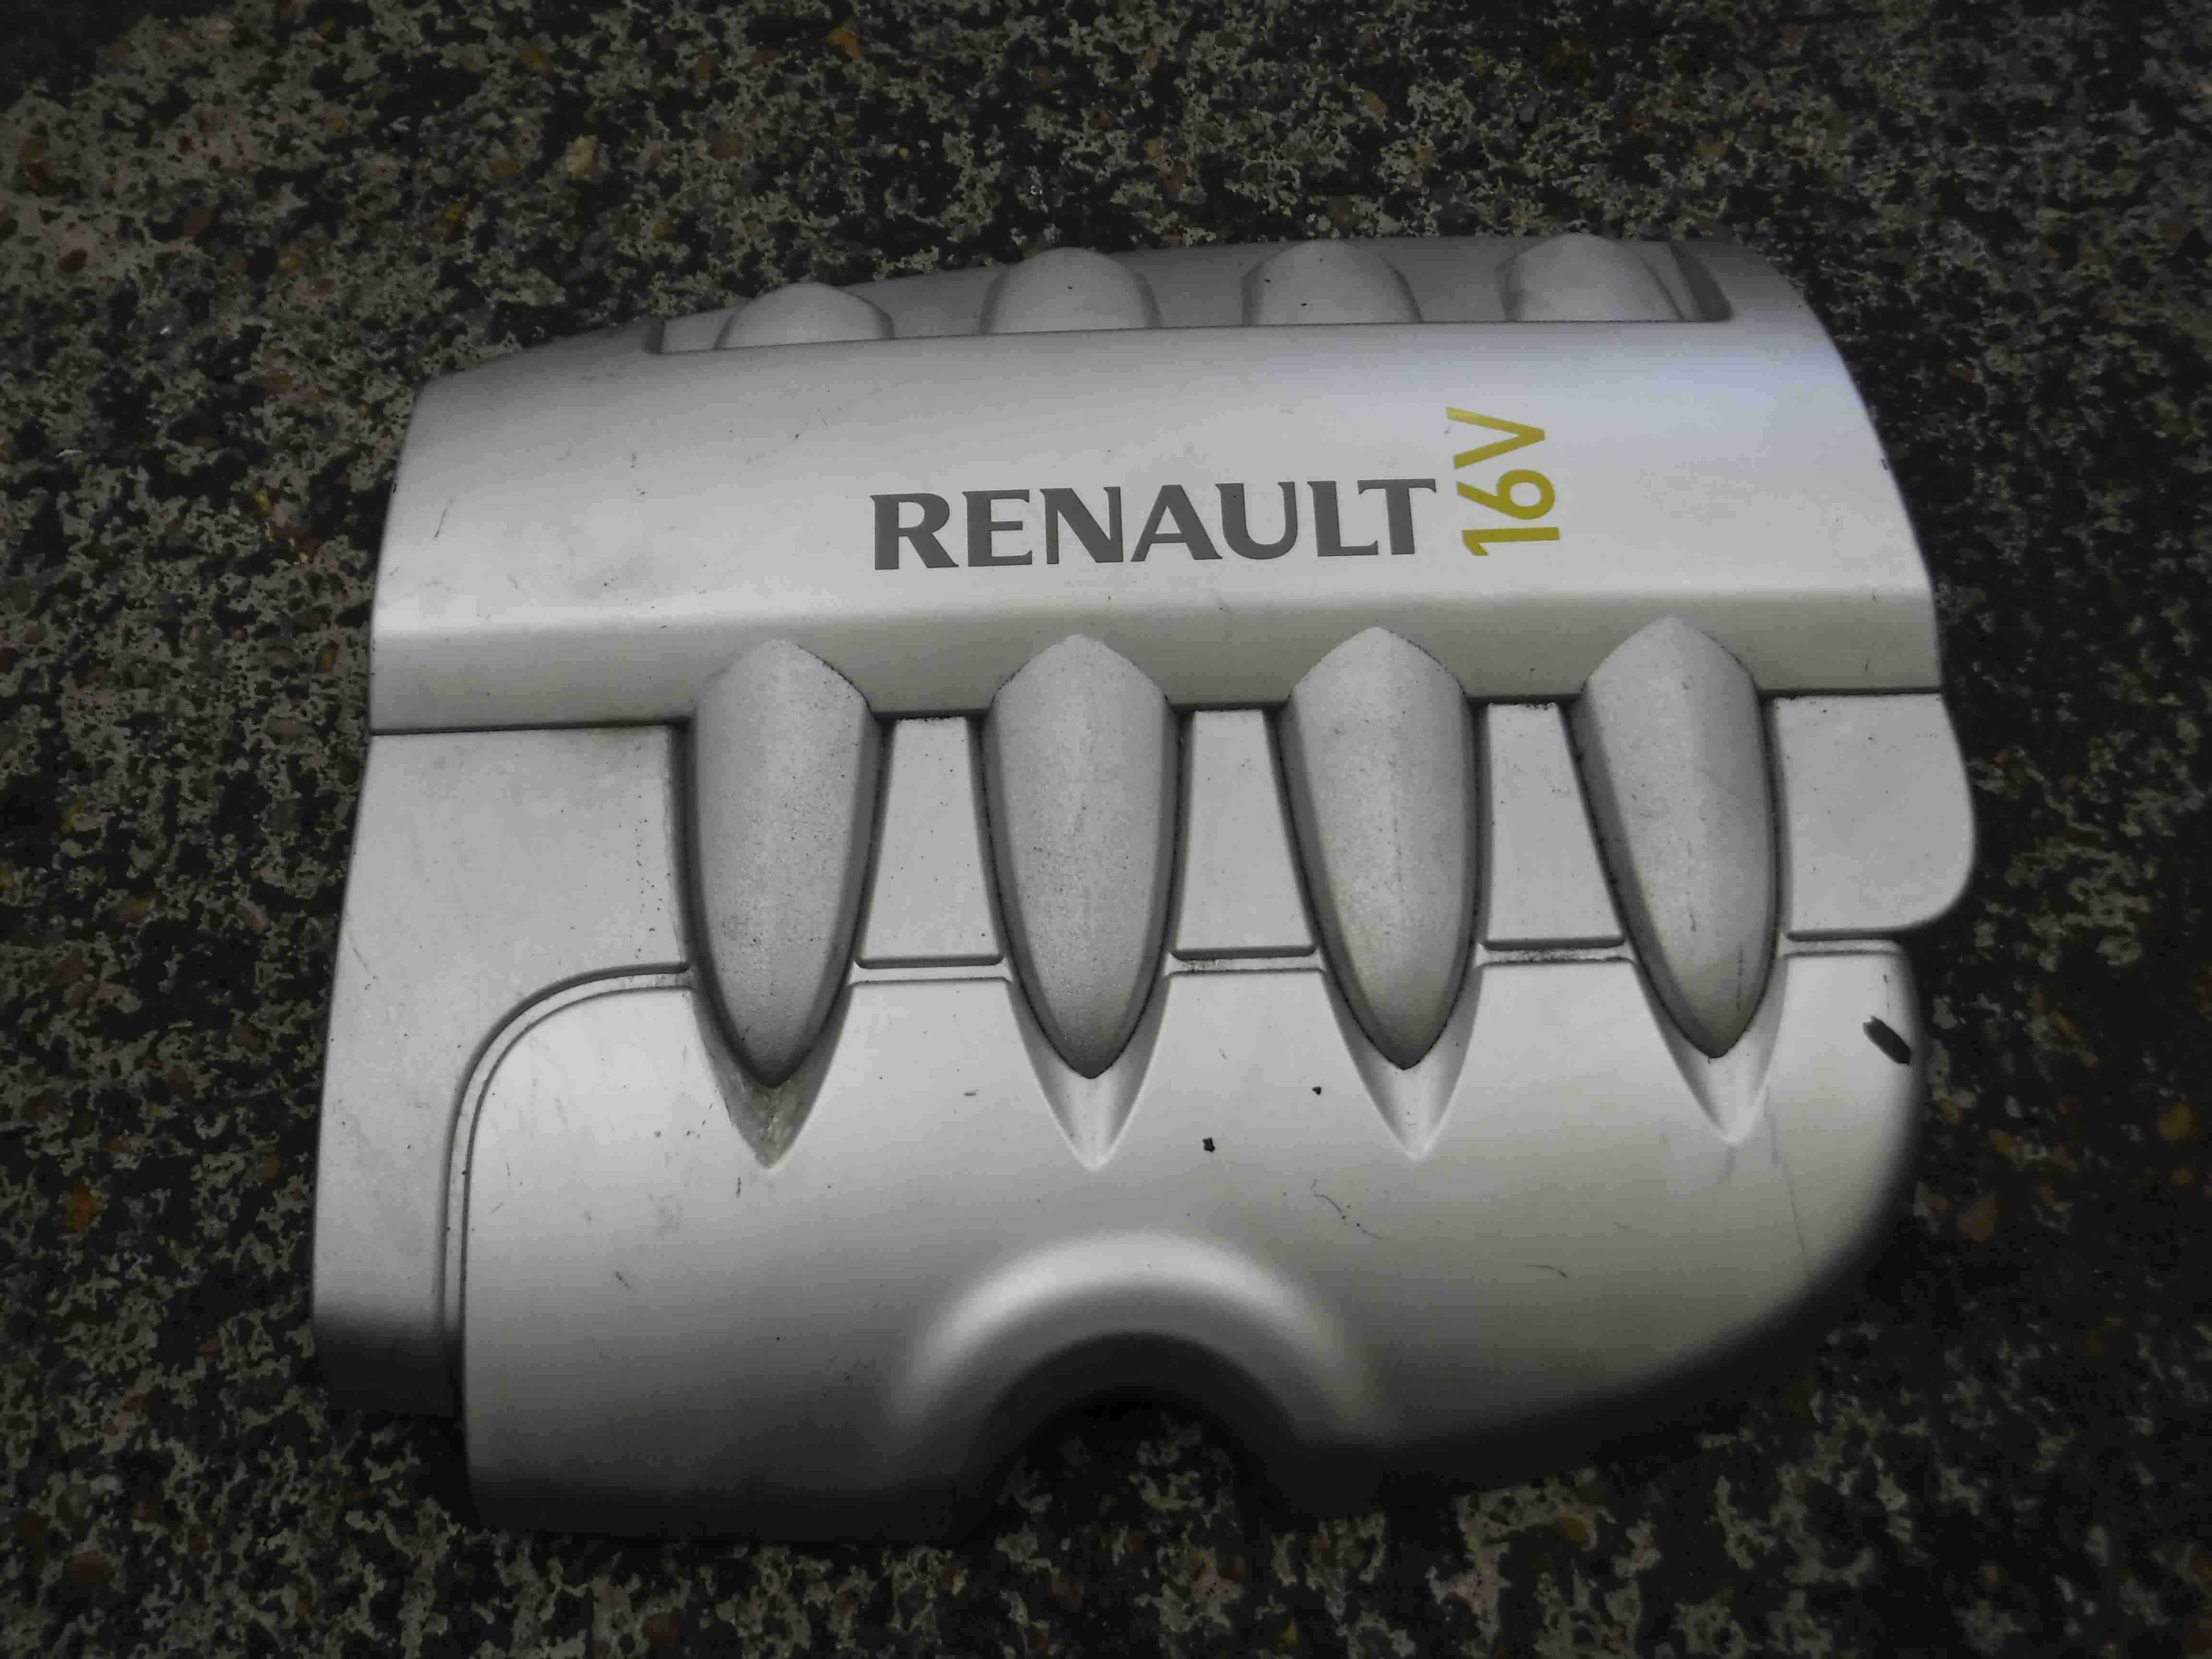 Renault Clio MK3 2005-2009 1.6 16v Engine Cover Plastic 8200323607